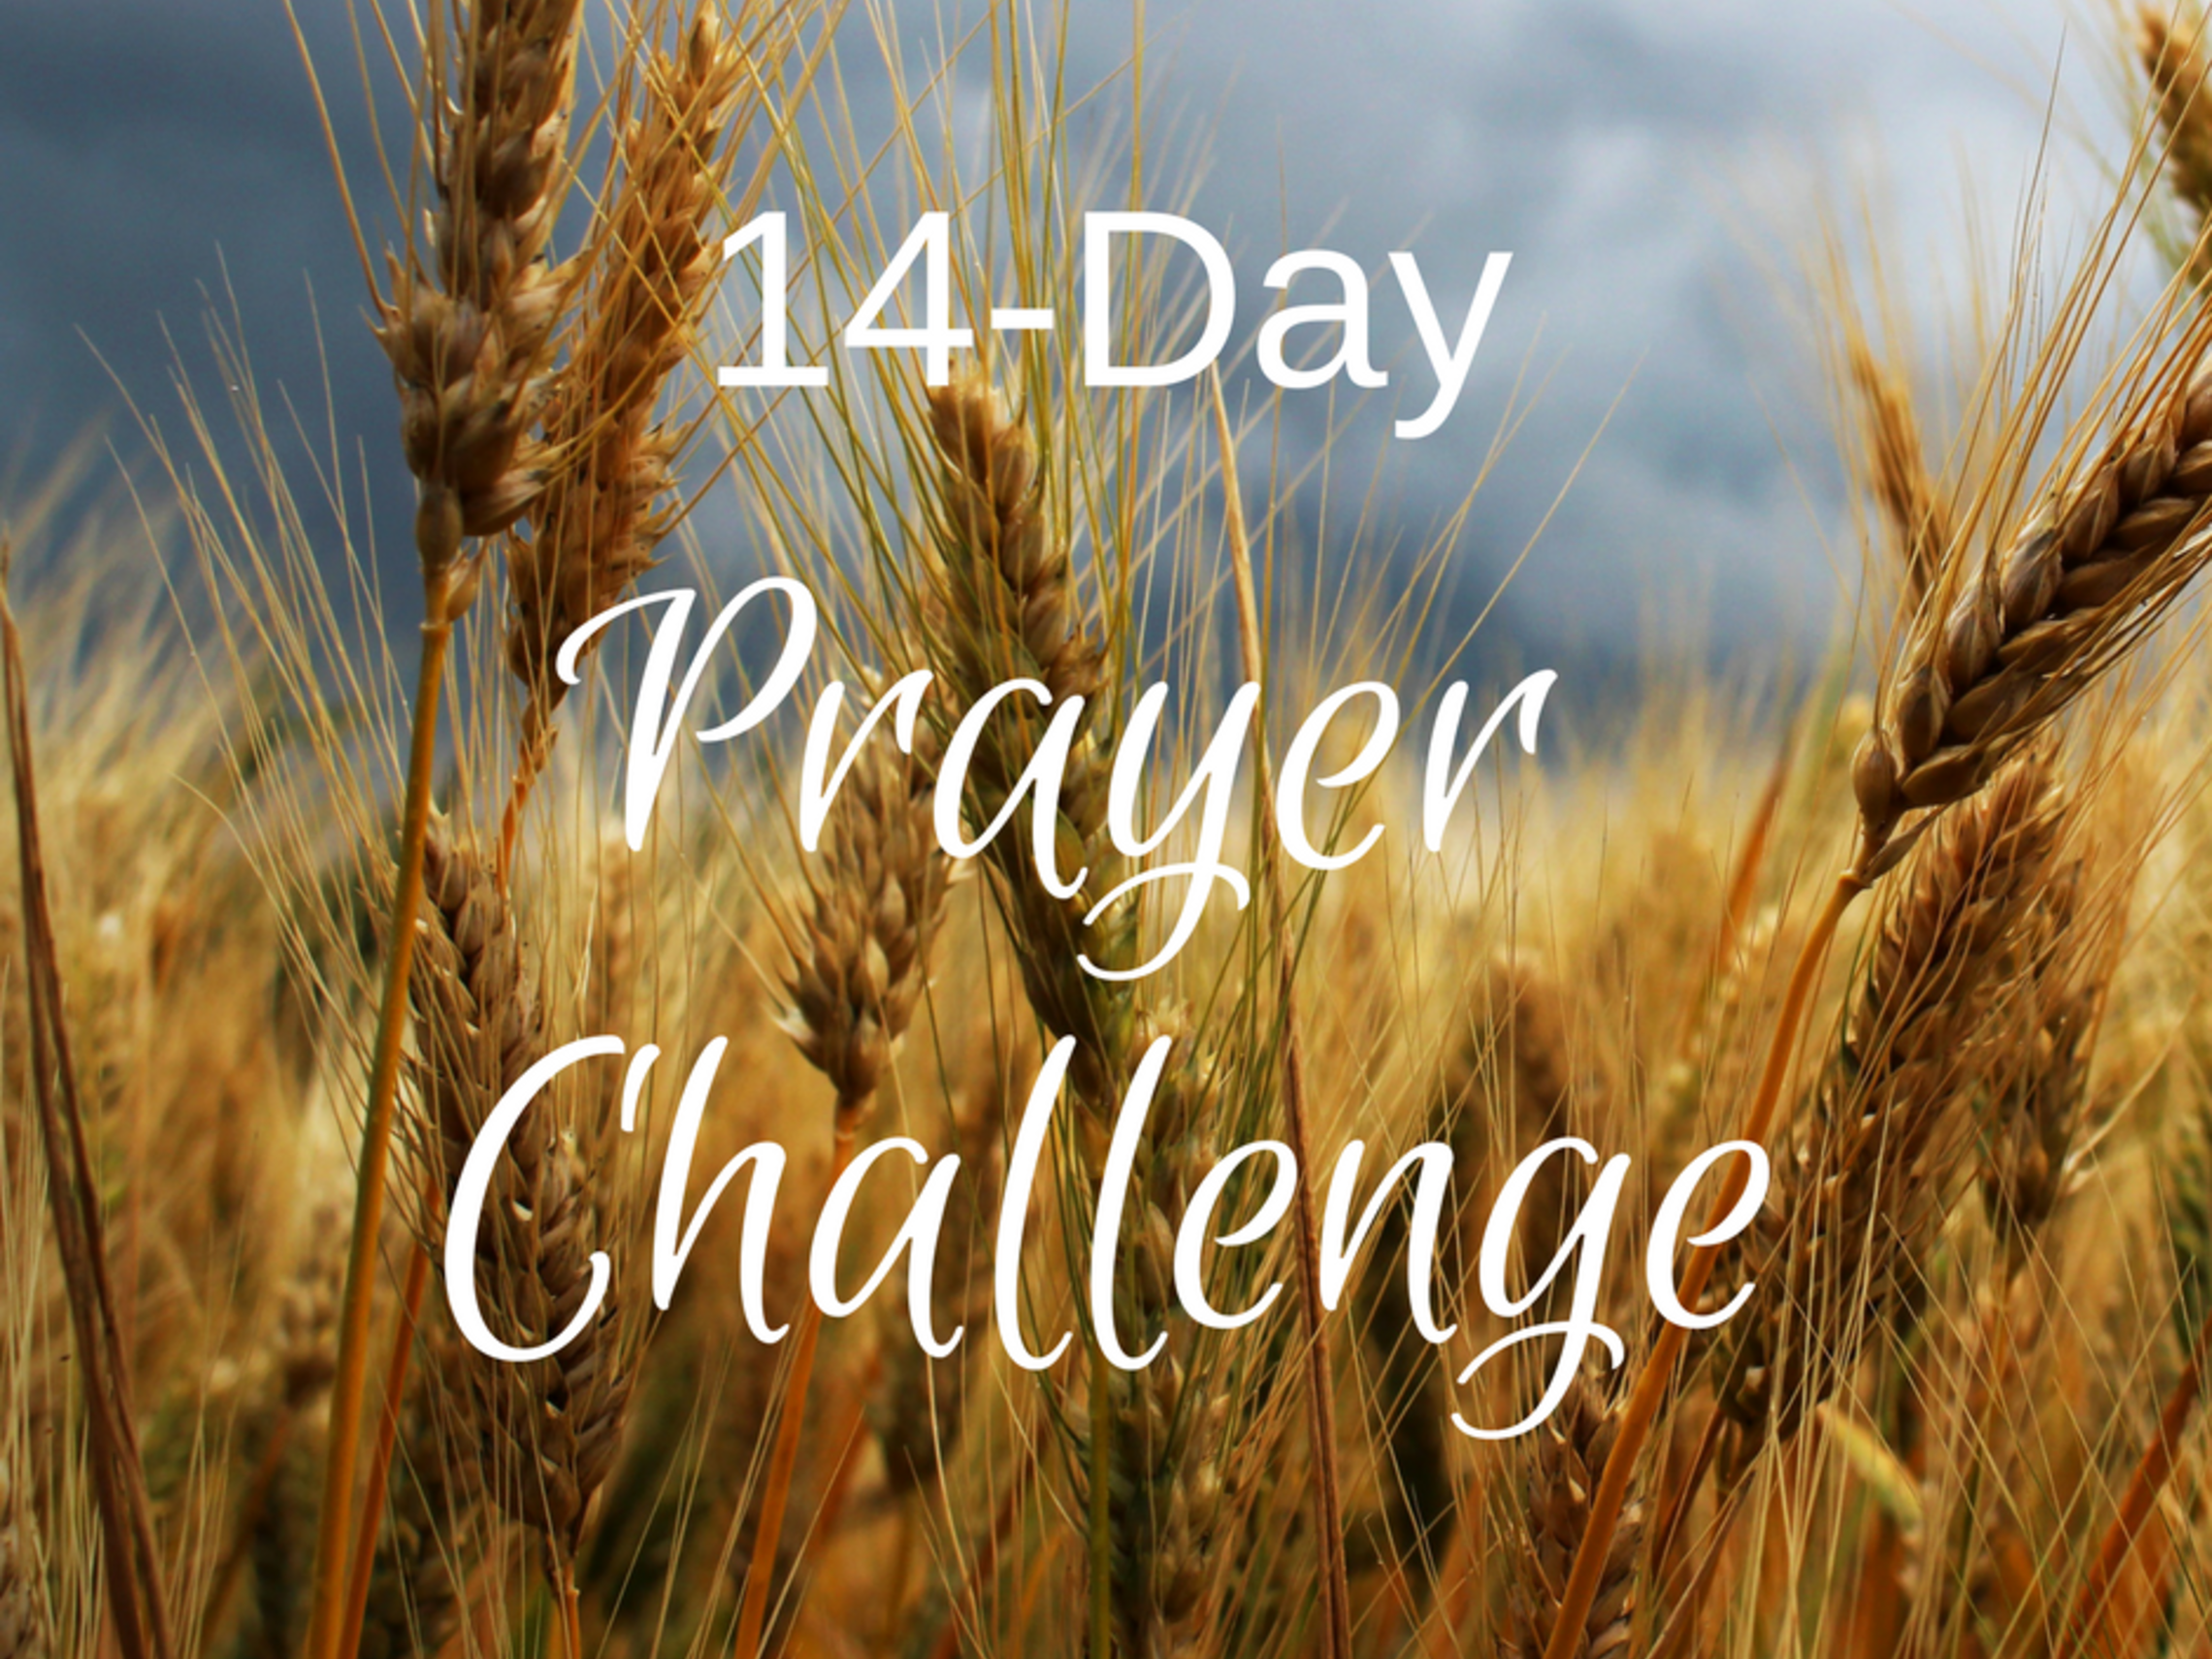 14 Day Prayer Challenge 1